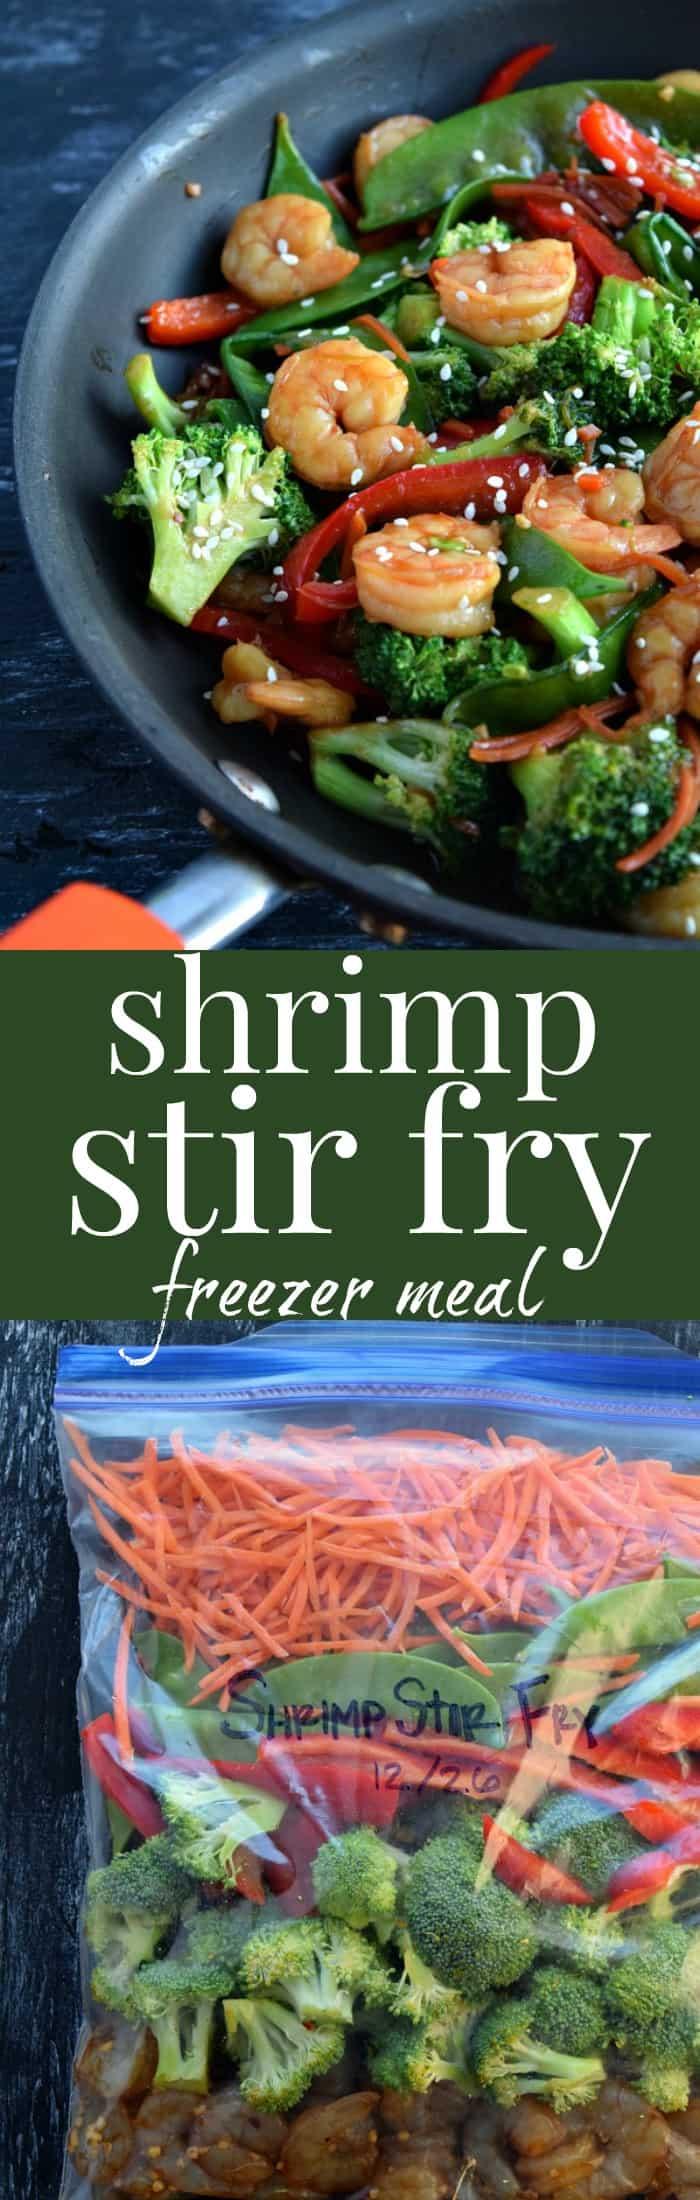 Shrimp Stir Fry (Freezer Meal)